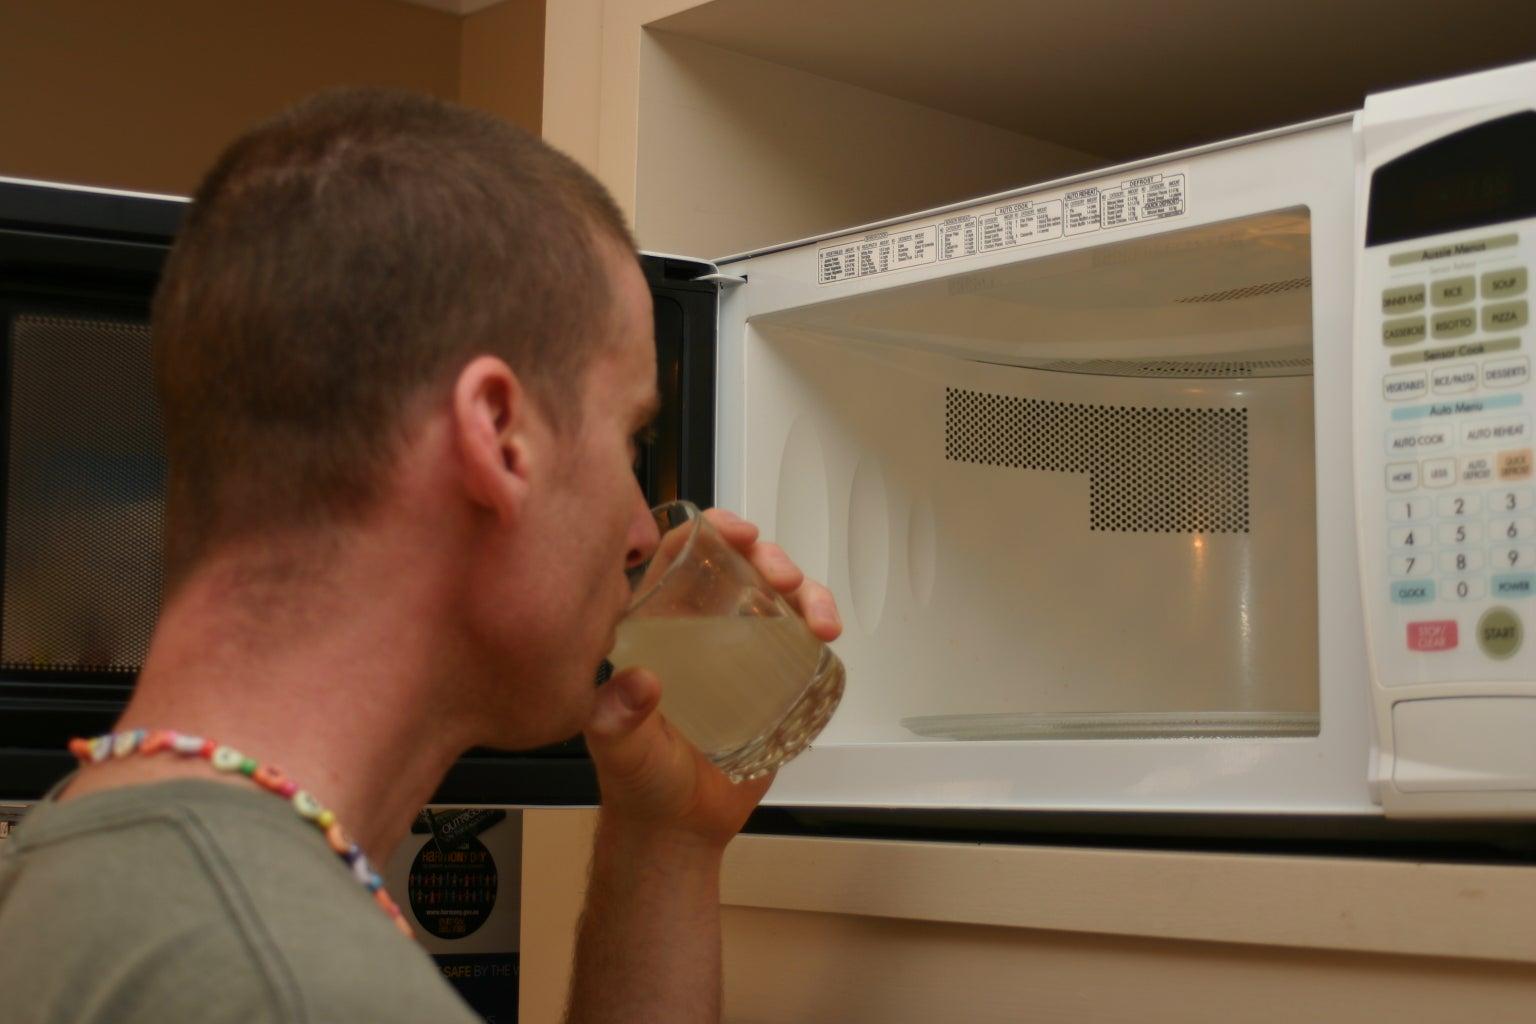 Enjoy Your Fresh Lemonade and Clean Microwave